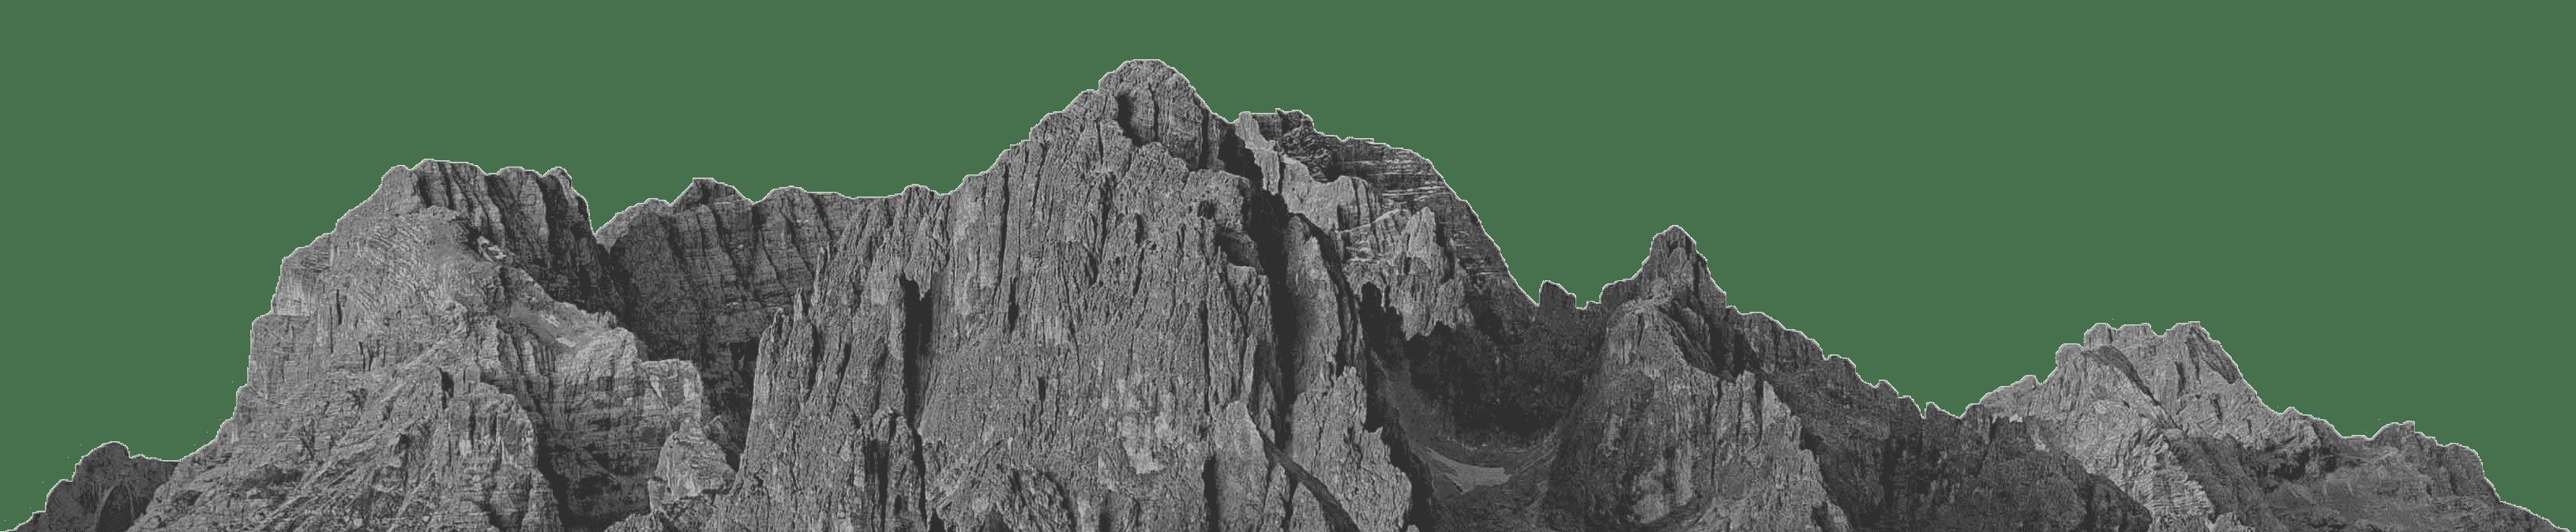 Berge Footer